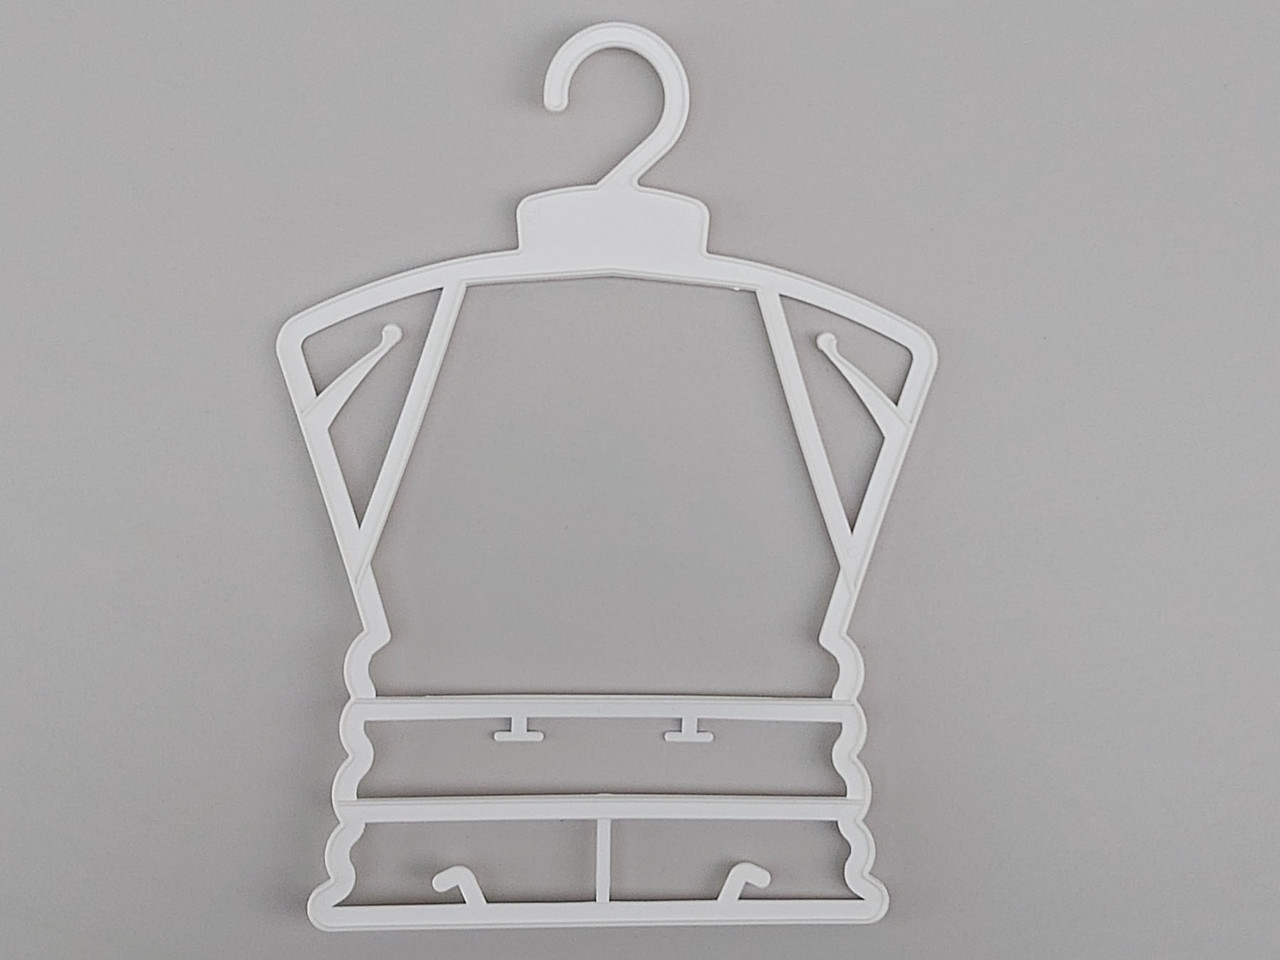 Плечики вешалки тремпеля каркас Л-23 белого цвета, длина 23 см